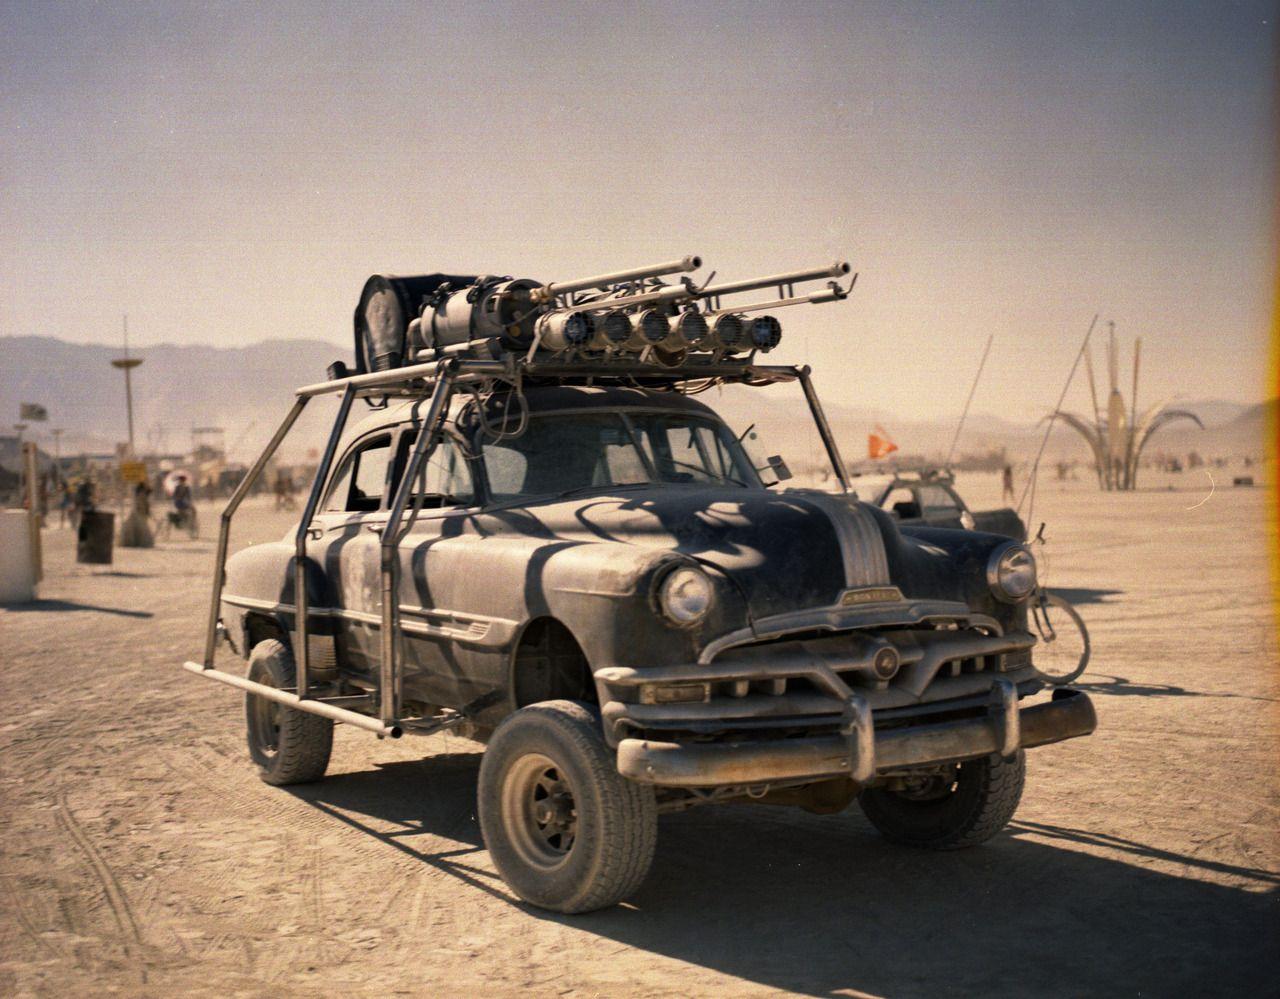 Mad Max 4 Fury Road 2015 Possible Vehicle by MALTIAN Dan